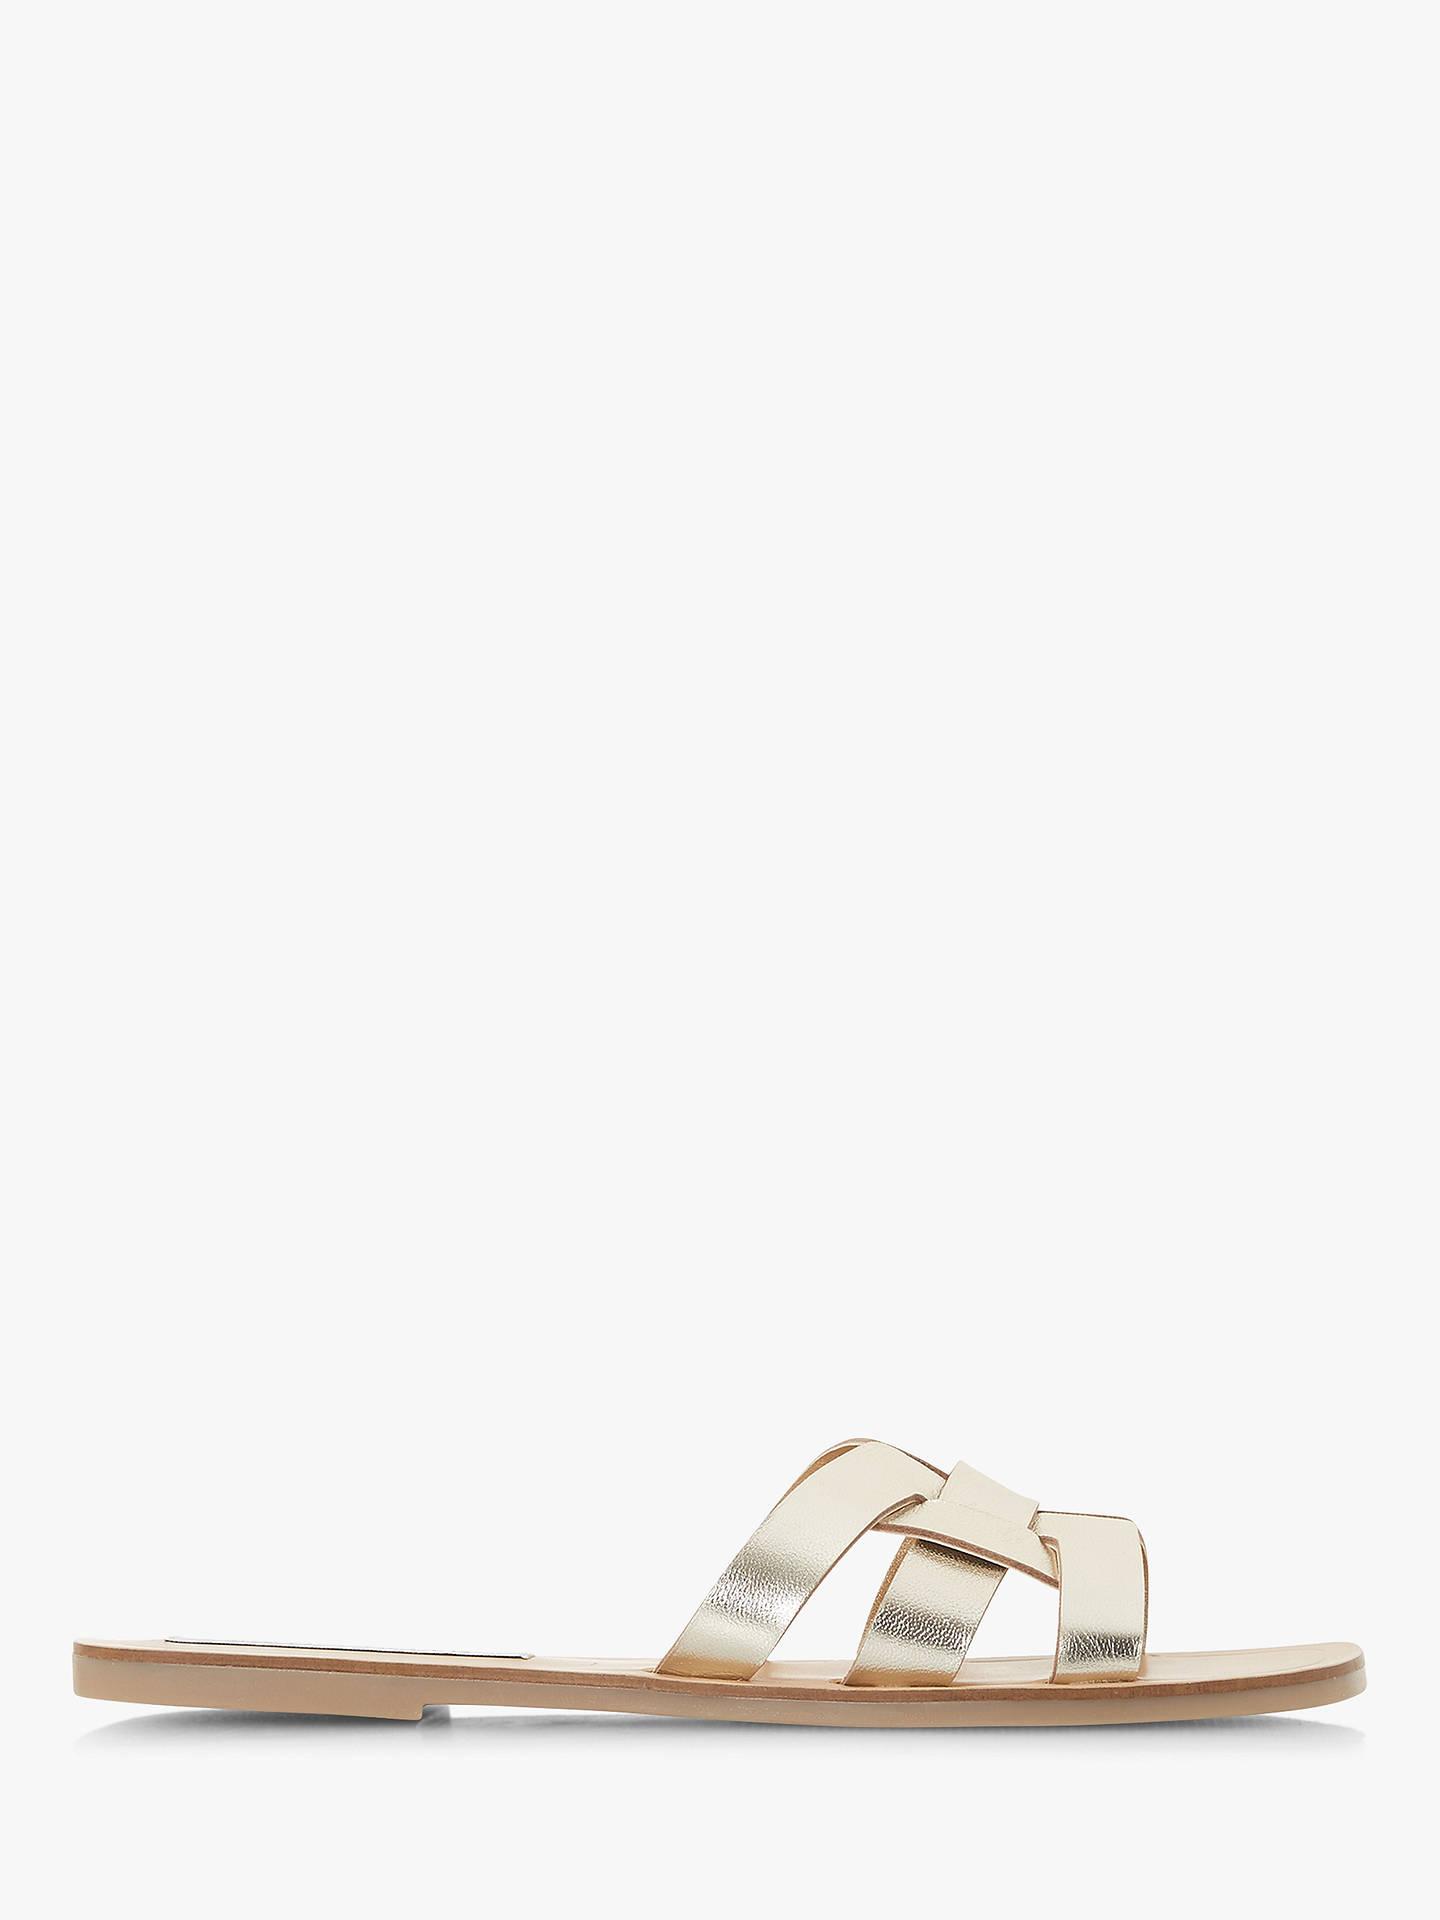 89ee3890920 Steve Madden Sicily Flat Sandals at John Lewis   Partners